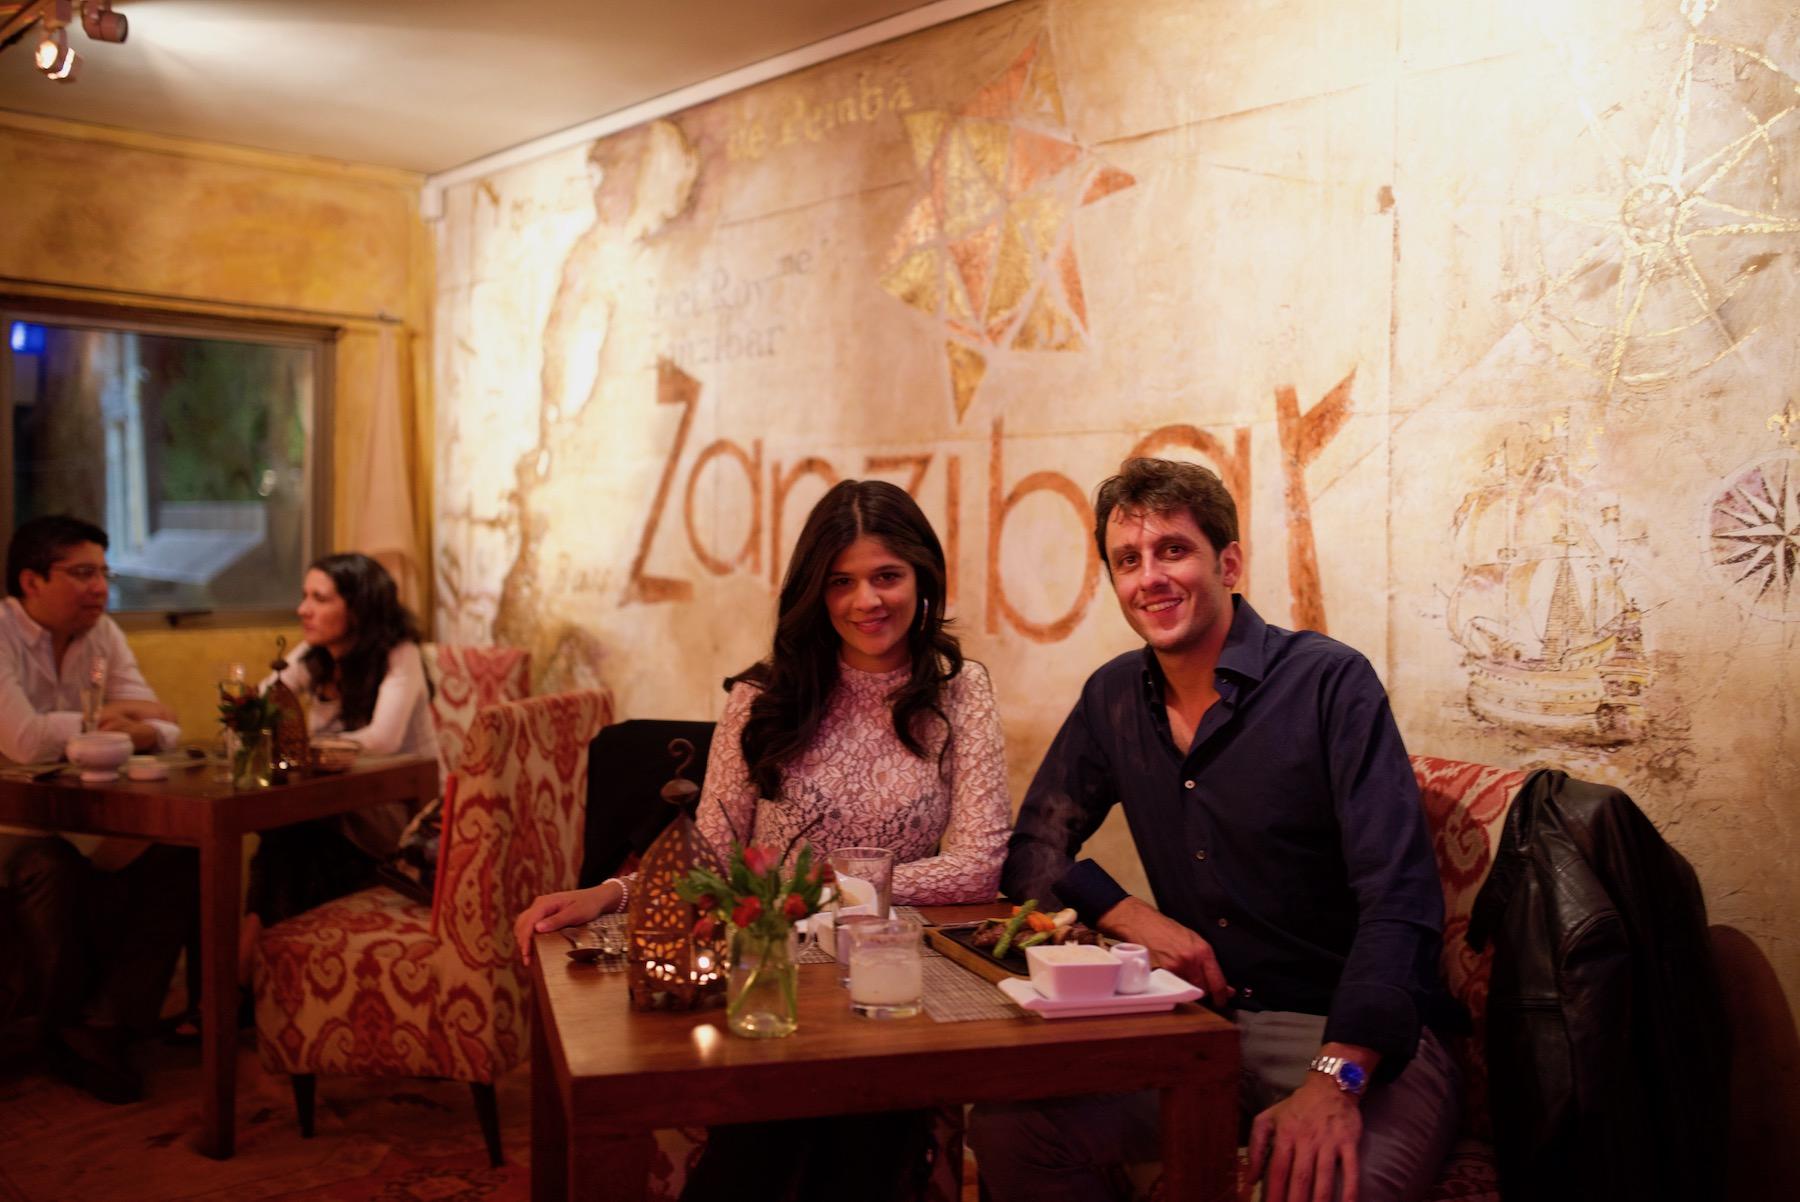 jantar-restaurante-zanzibar-santiago-chile-7